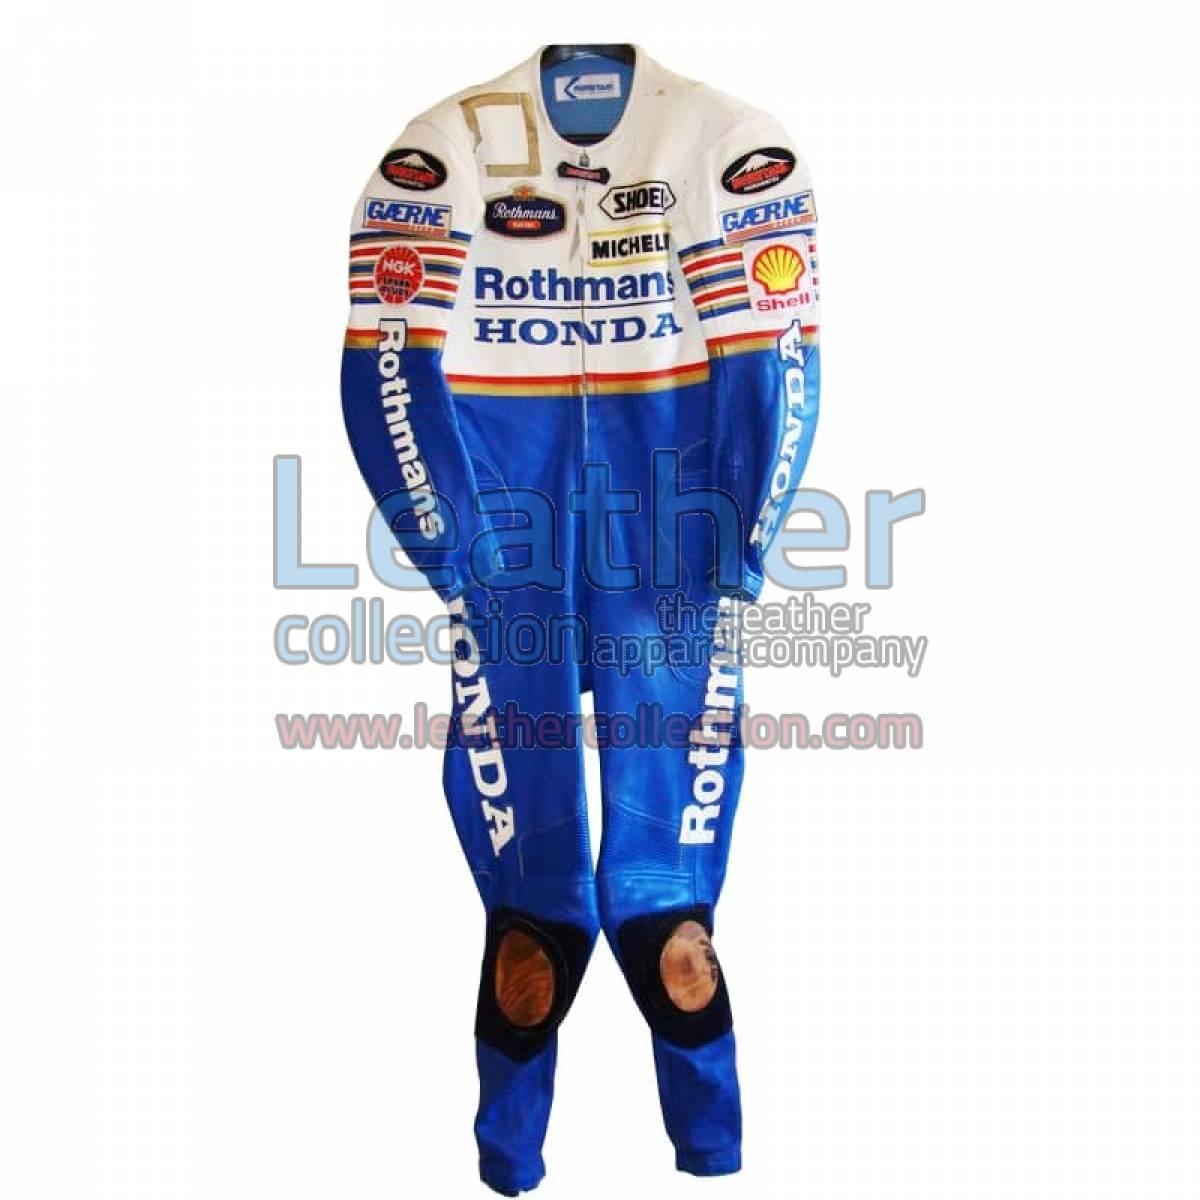 Wayne Gardner Rothmans Honda GP 1987 Leathers